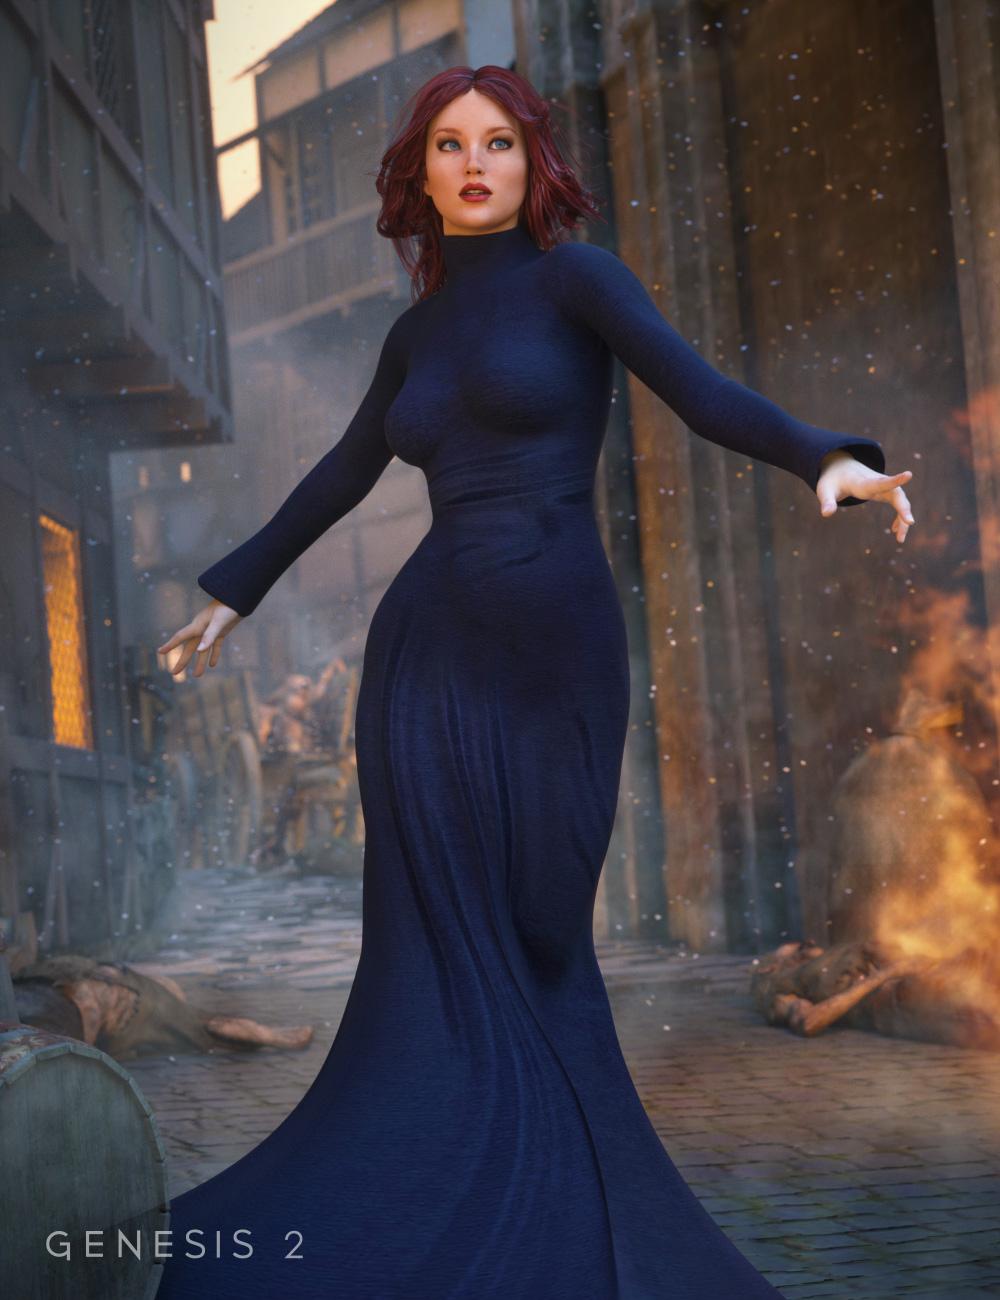 Morphing Fantasy Dress for Genesis 2 Female(s) by: JGreenleesRavenhair, 3D Models by Daz 3D